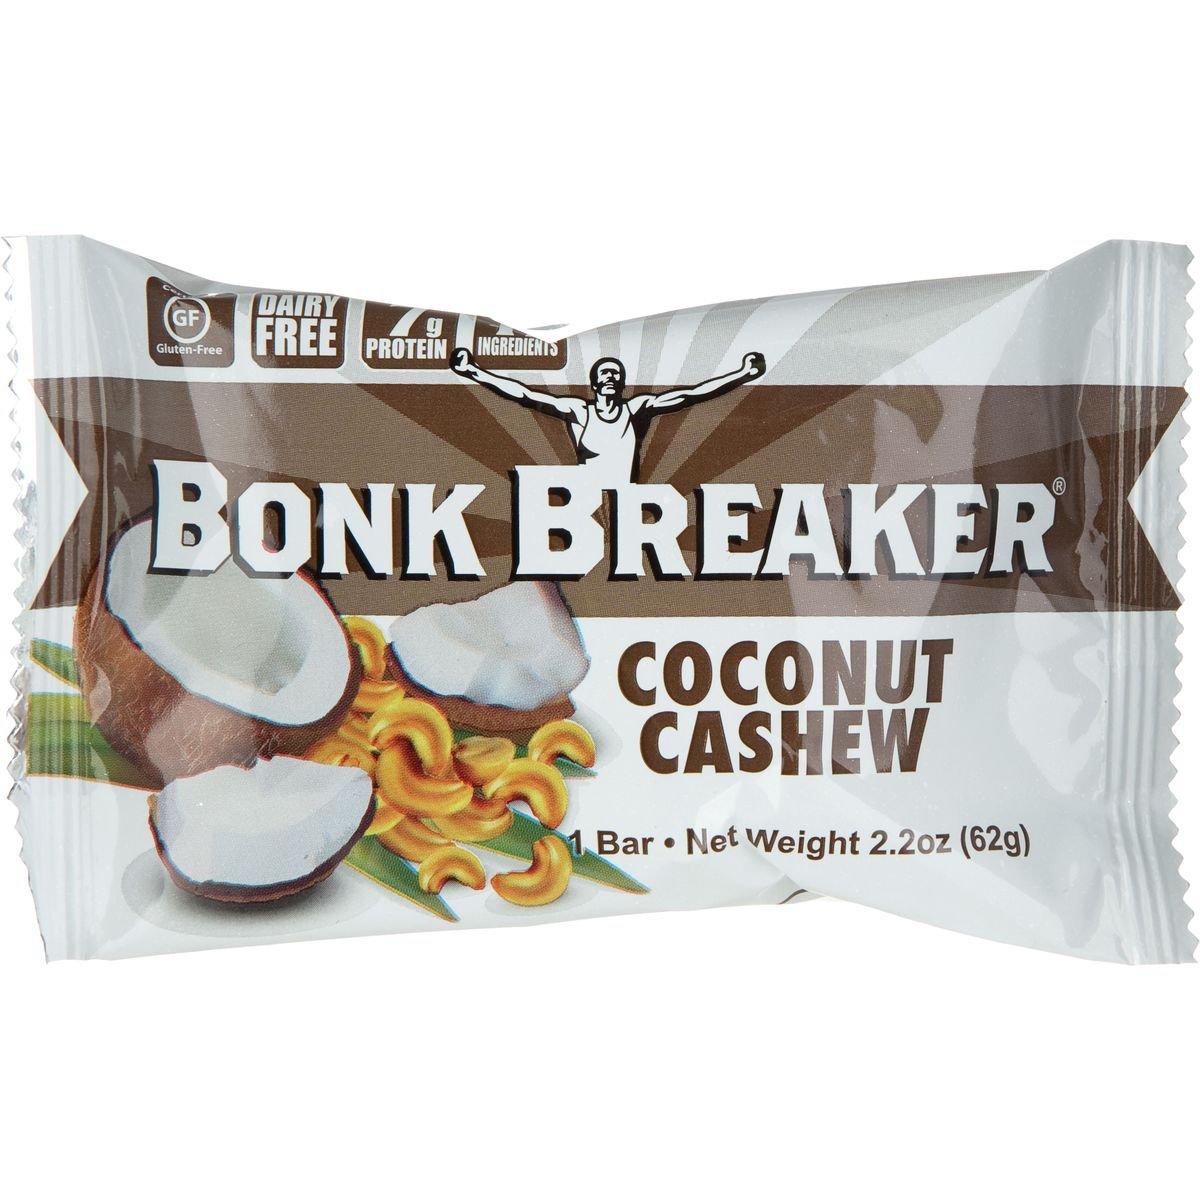 Bonk Breaker Energy Bar - Coconut Cashew - 2.2 Oz - Case Of 12